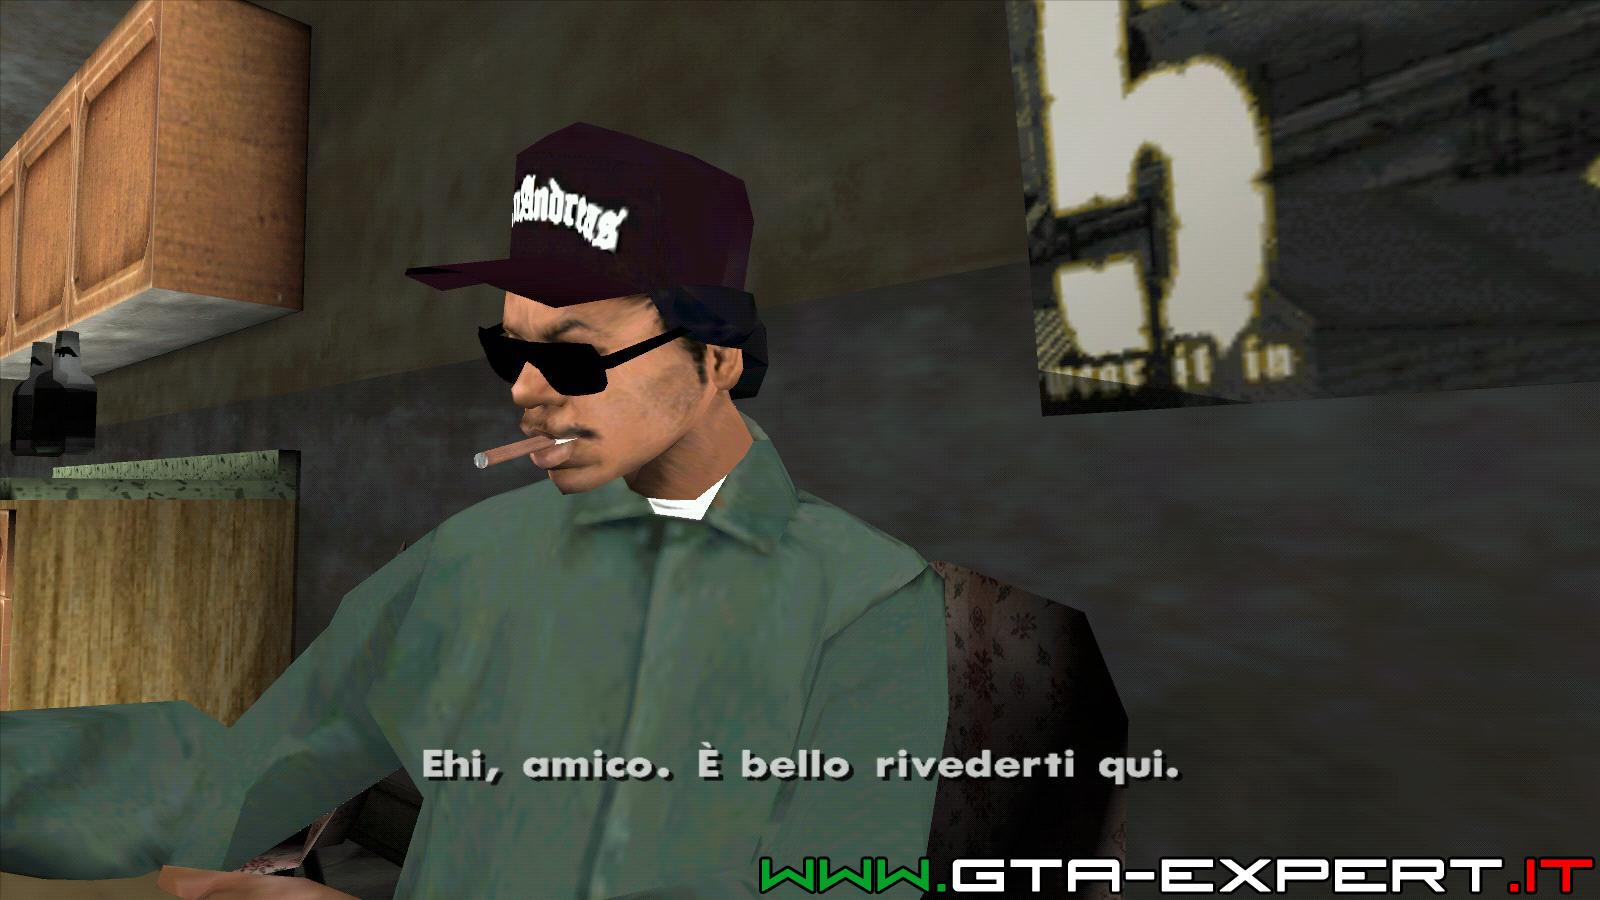 Ryder  GTA San Andreas  GTAExpert